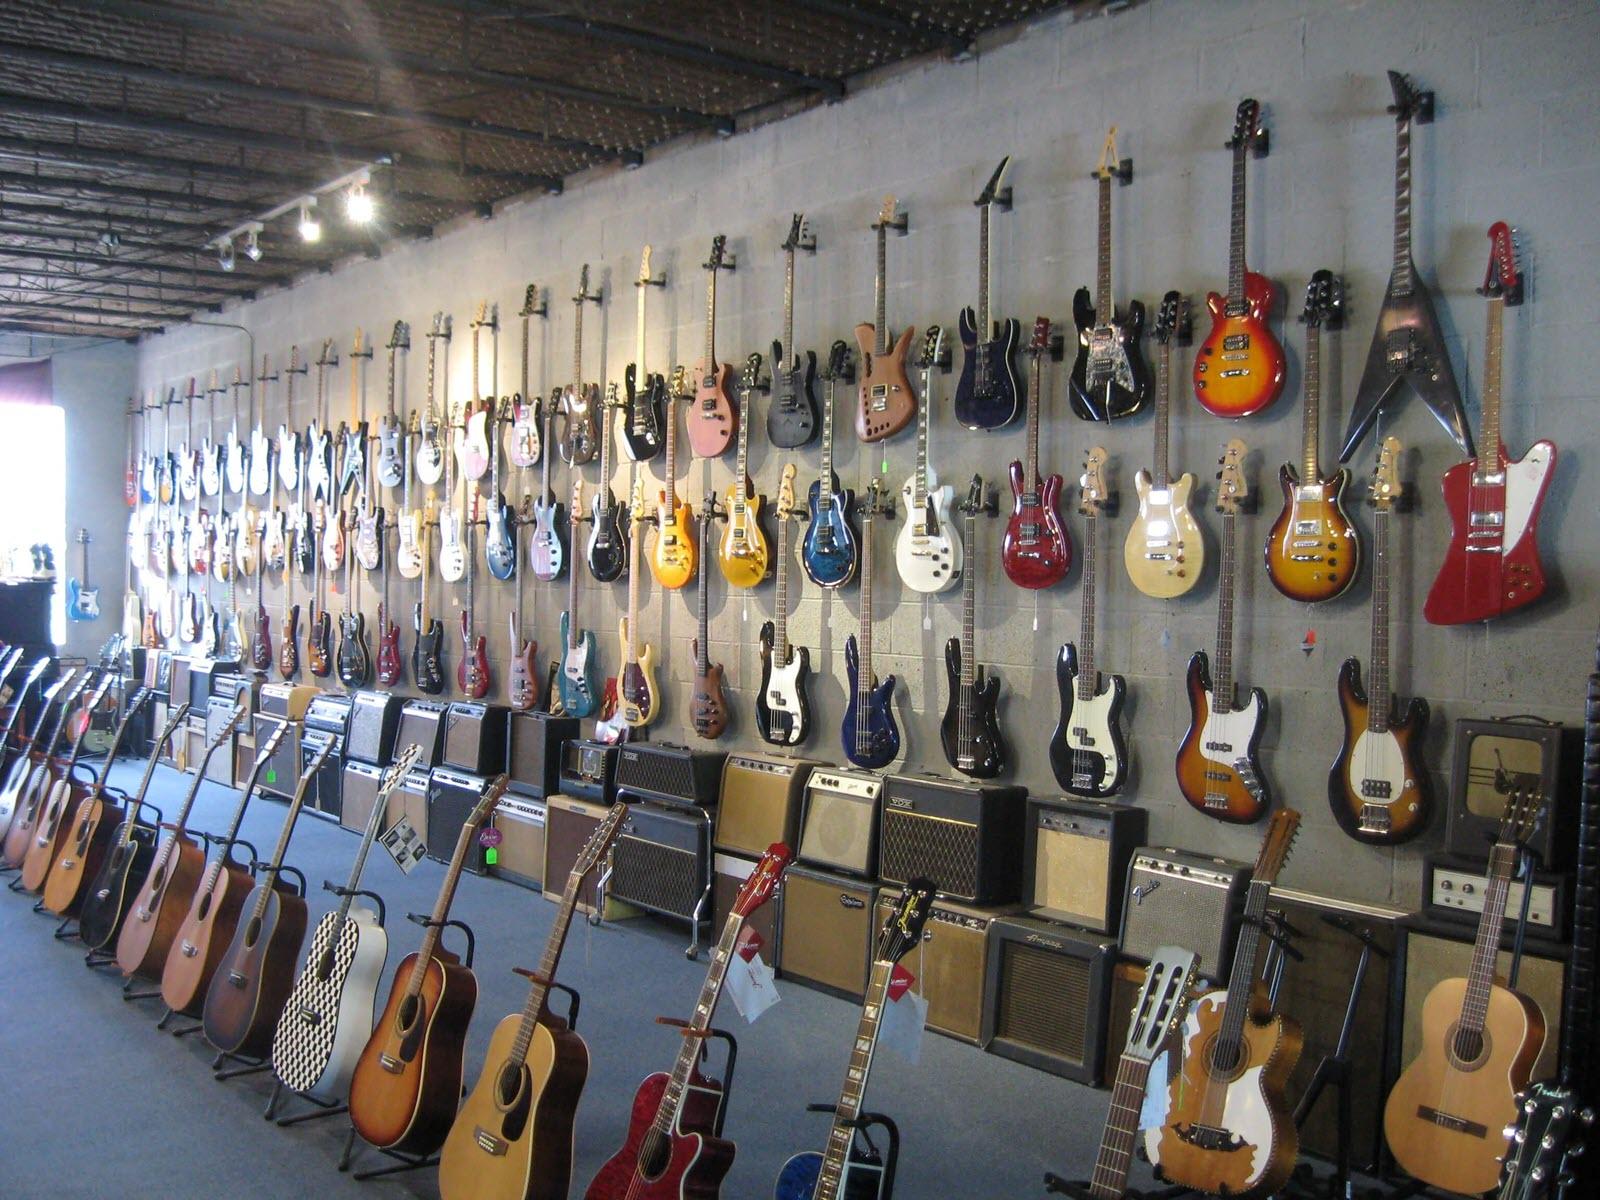 Acoustic Guitars, Electric Guitars, Bass Guitars